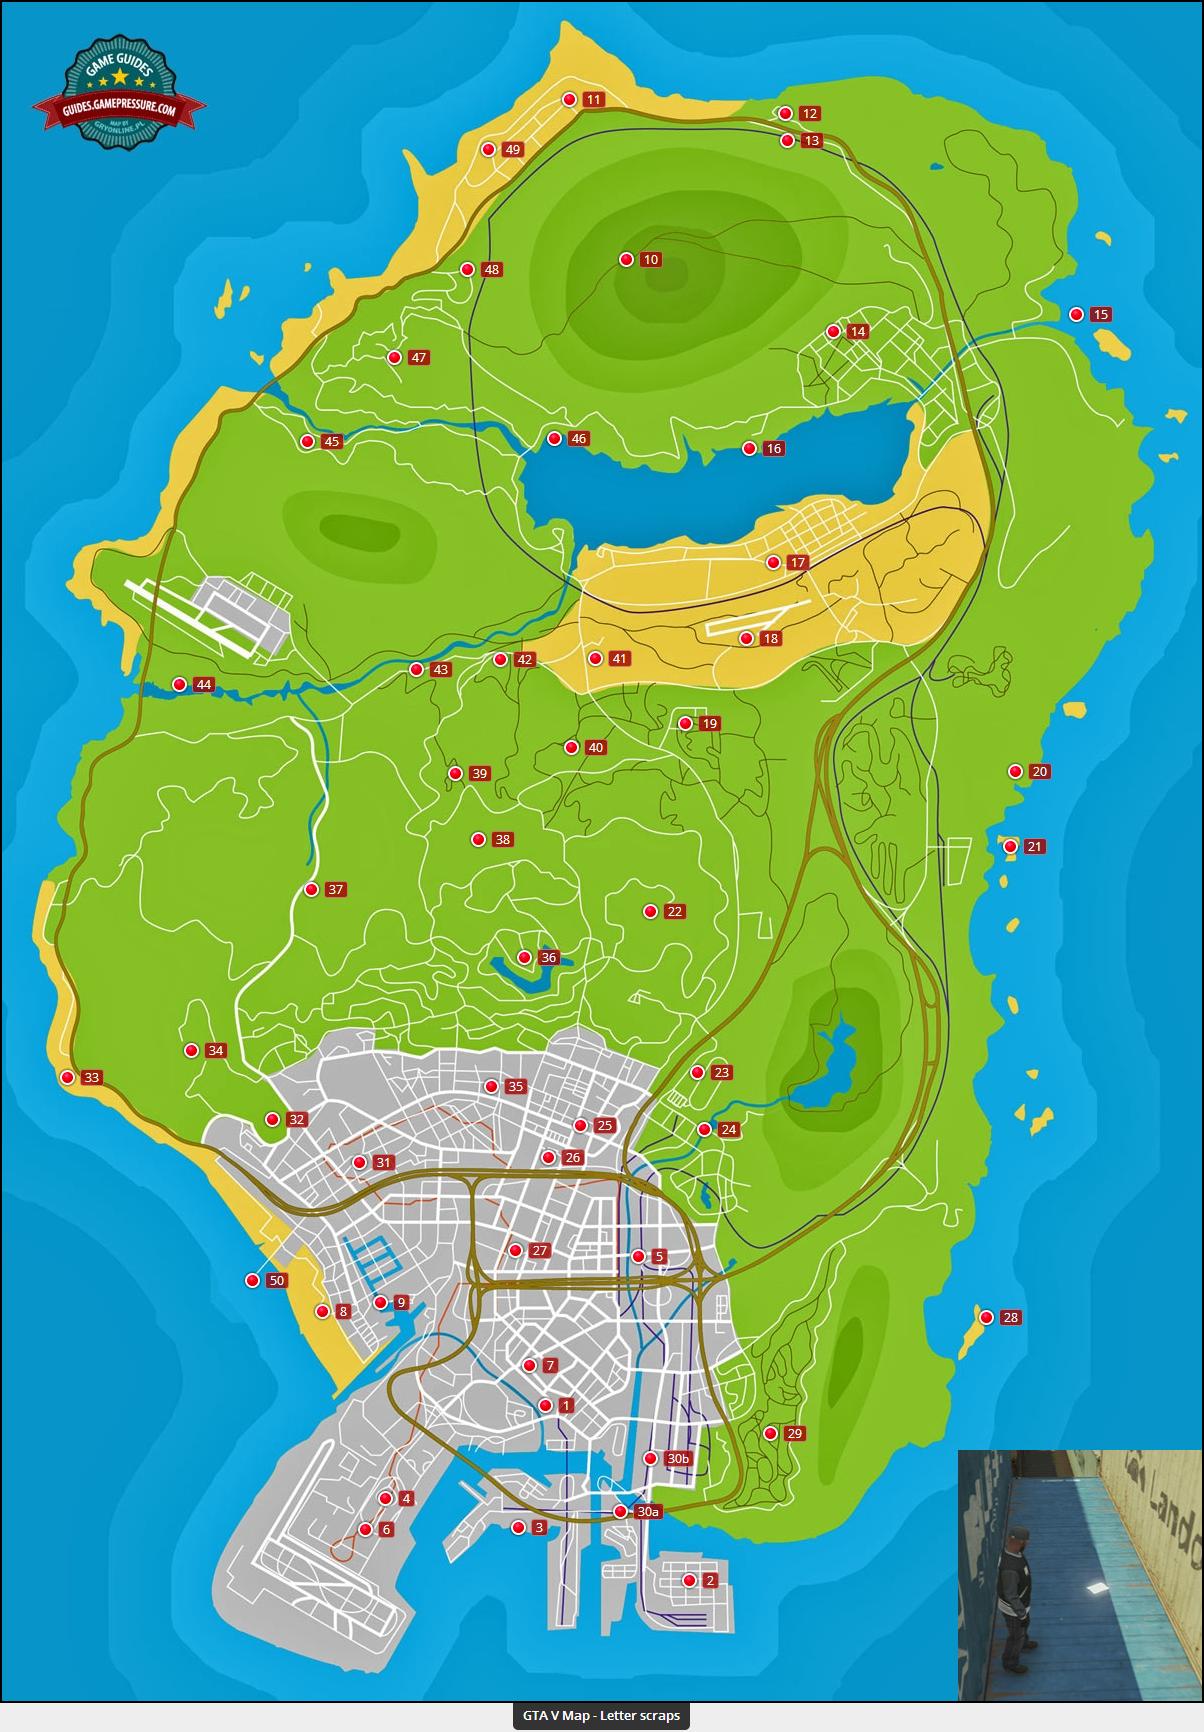 GTA V Letter Scraps Map Grand theft auto